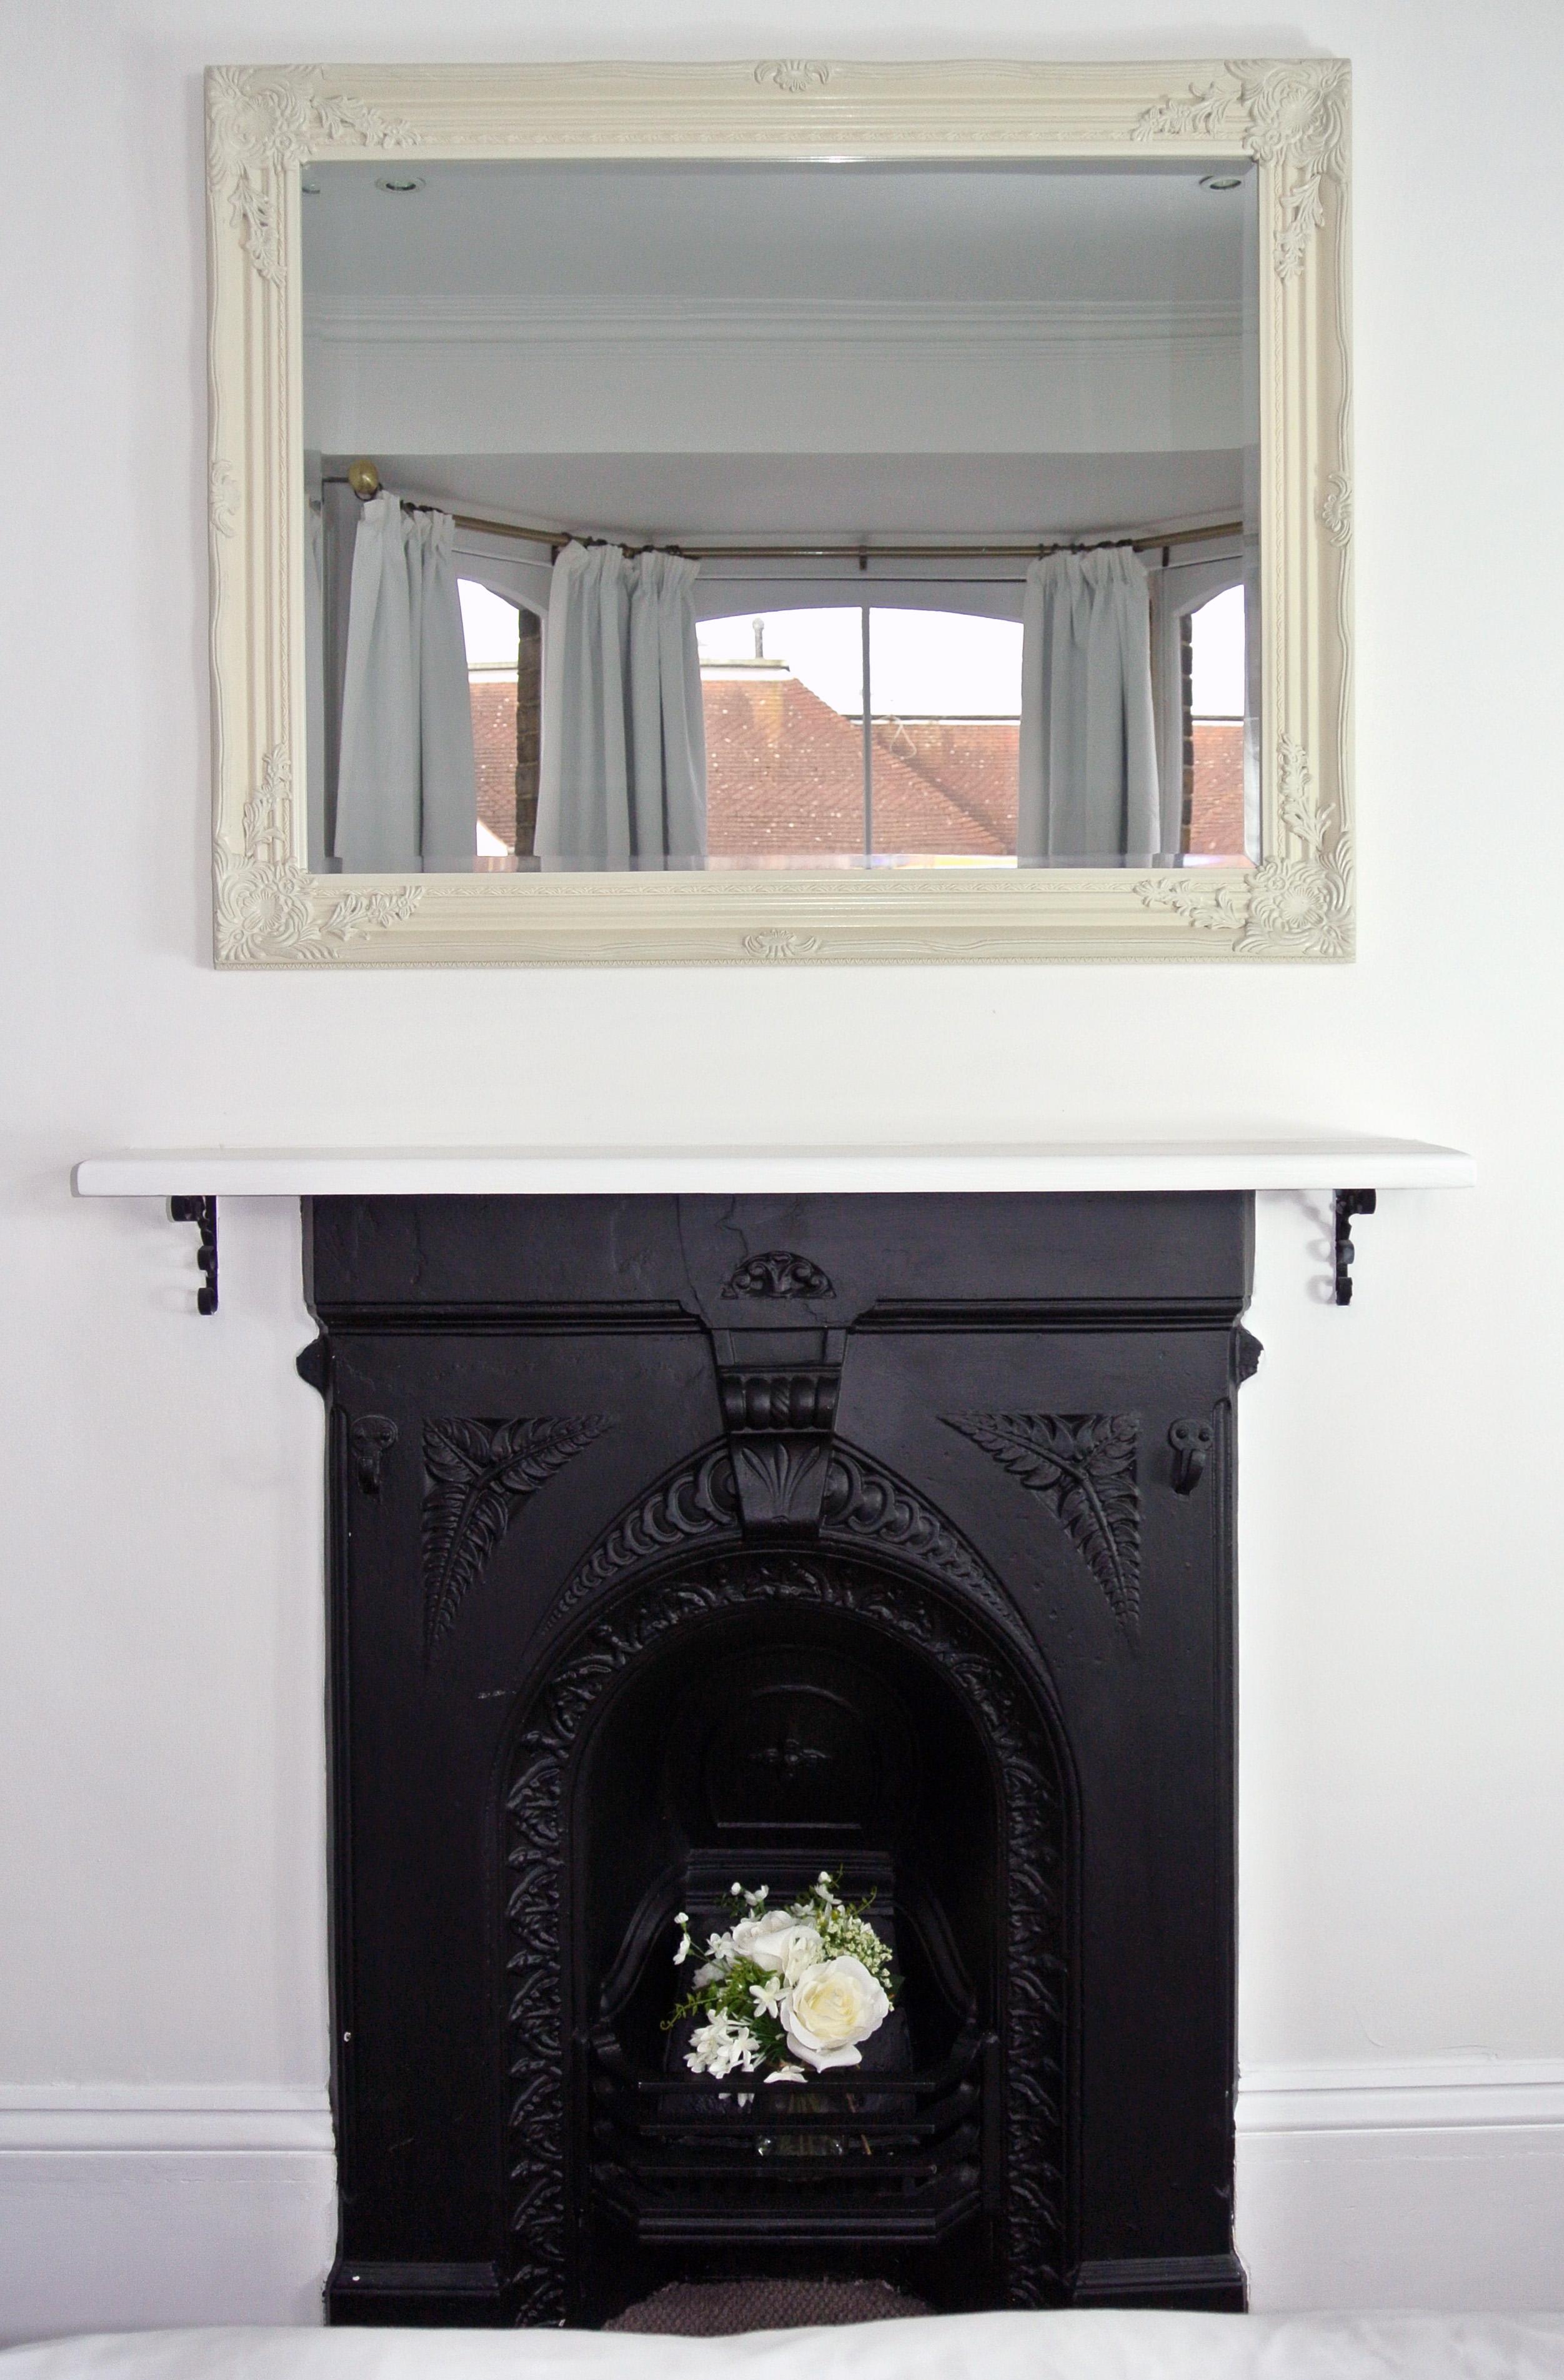 Albacore fireplace